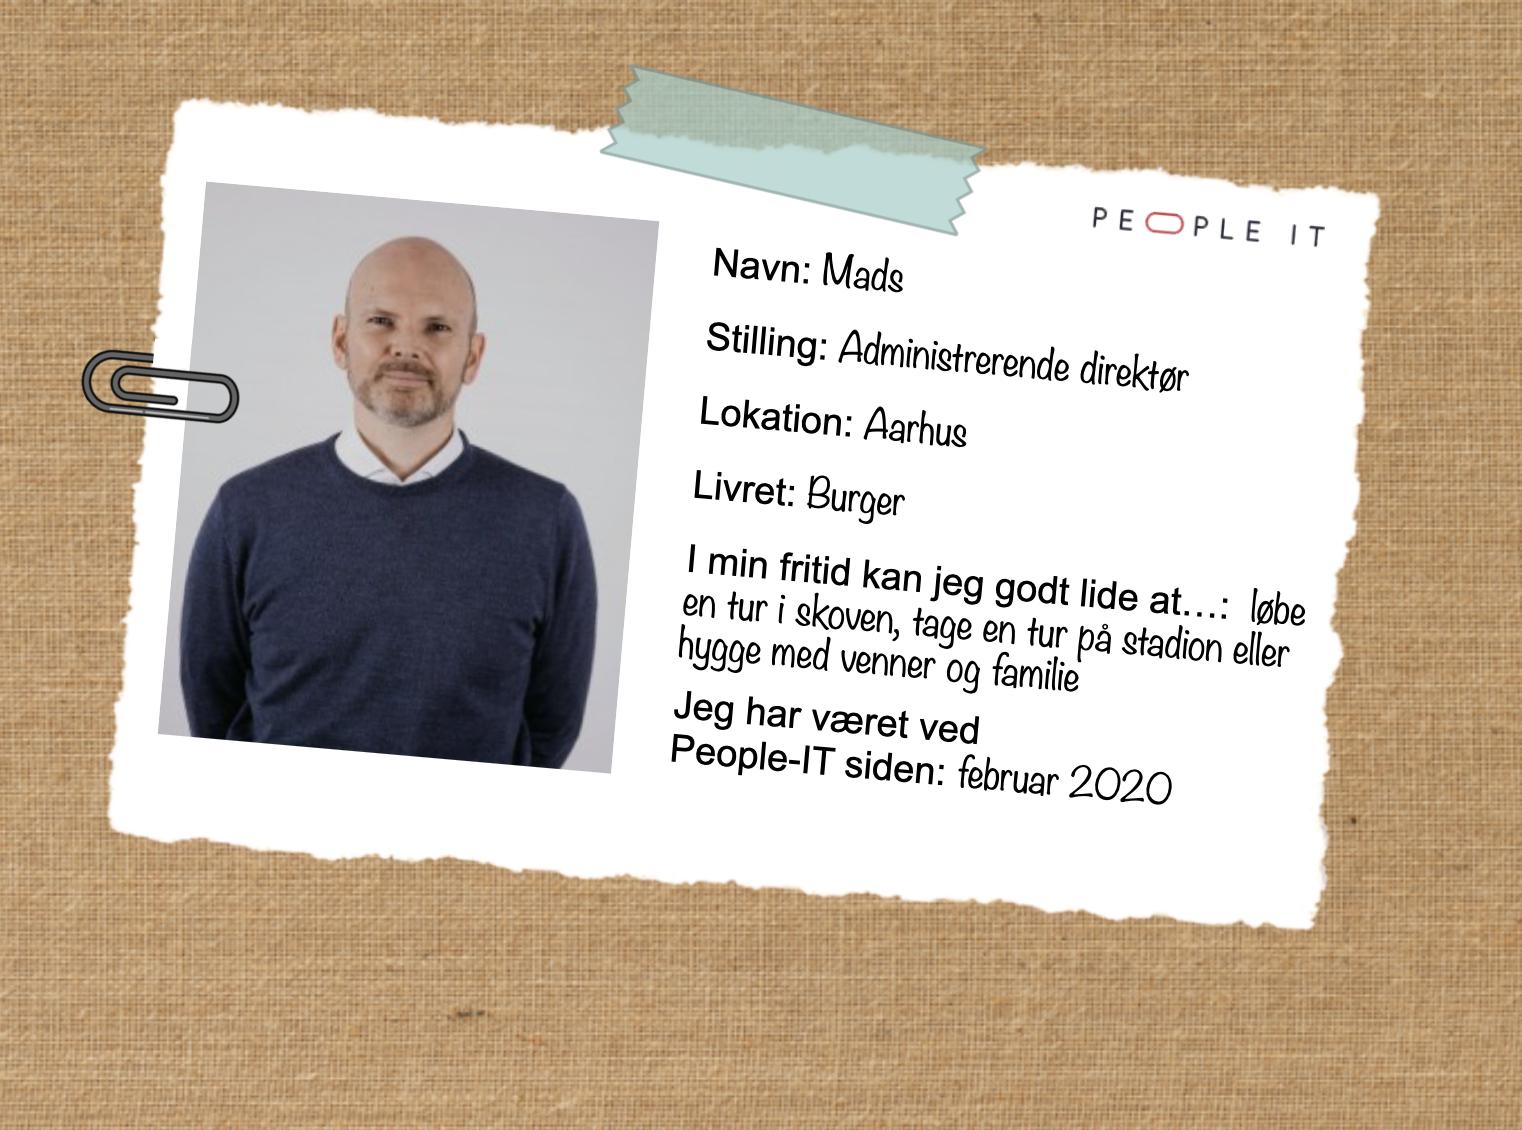 CVS. Mads. People-IT. Freelance IT konsulent